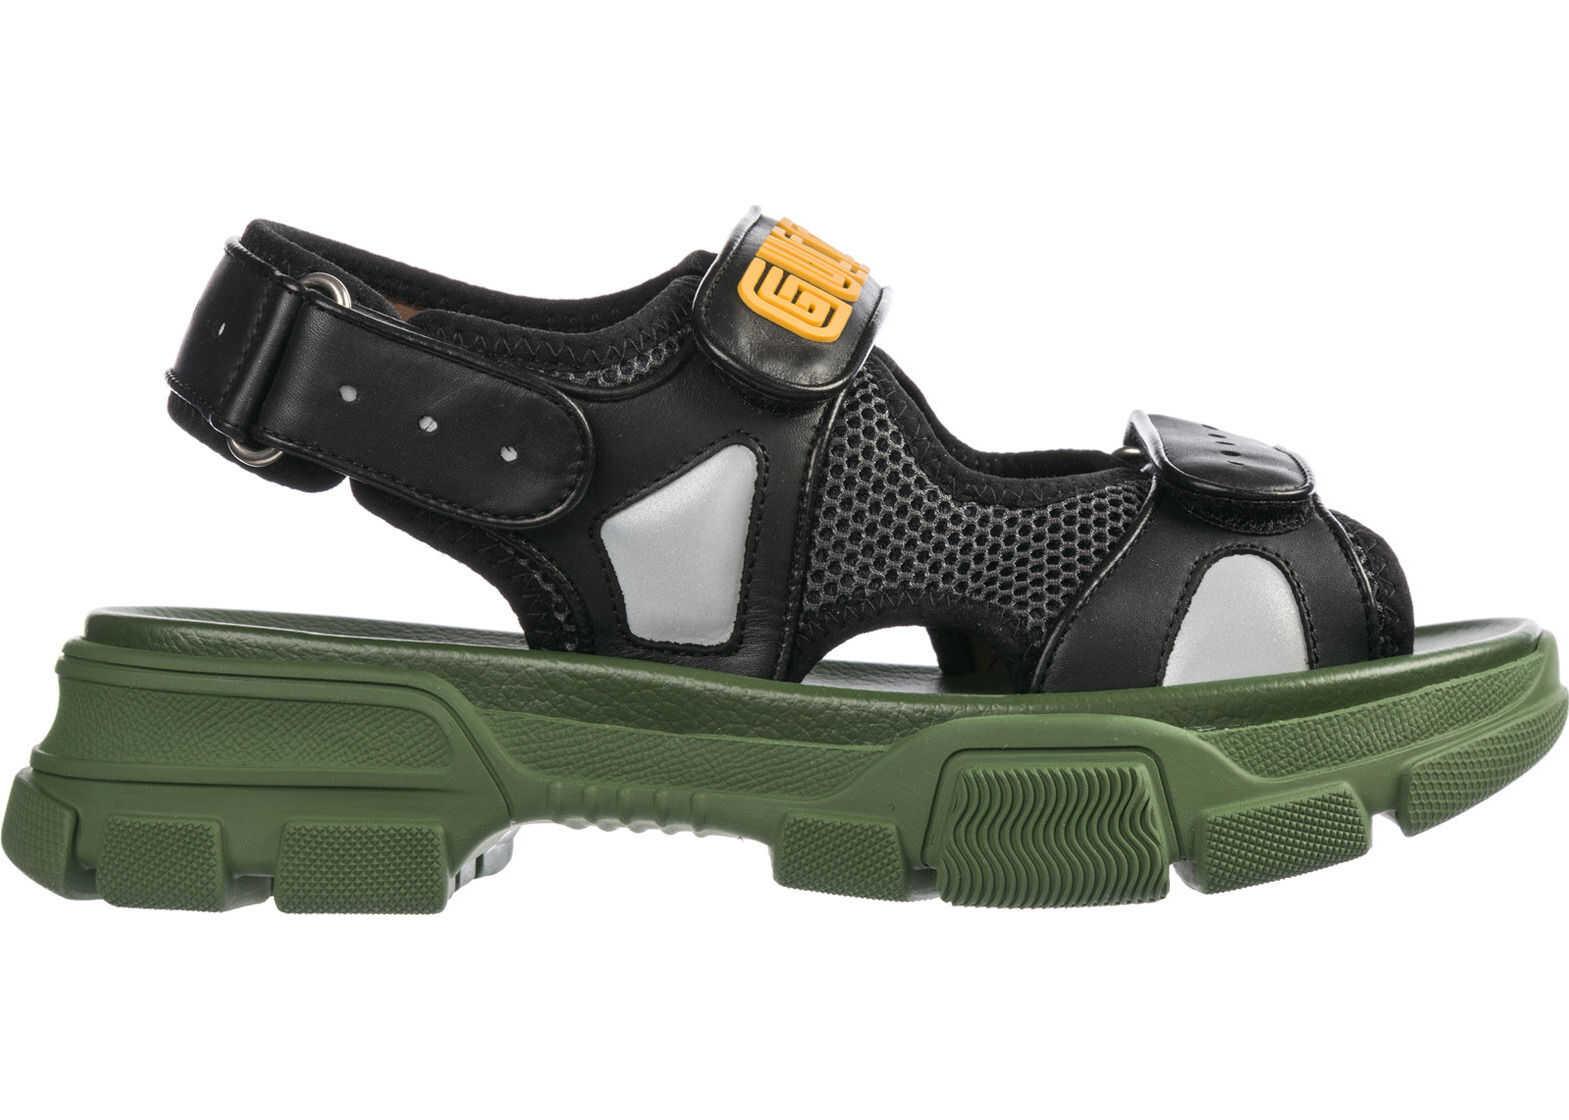 Gucci Leather Sandals Black